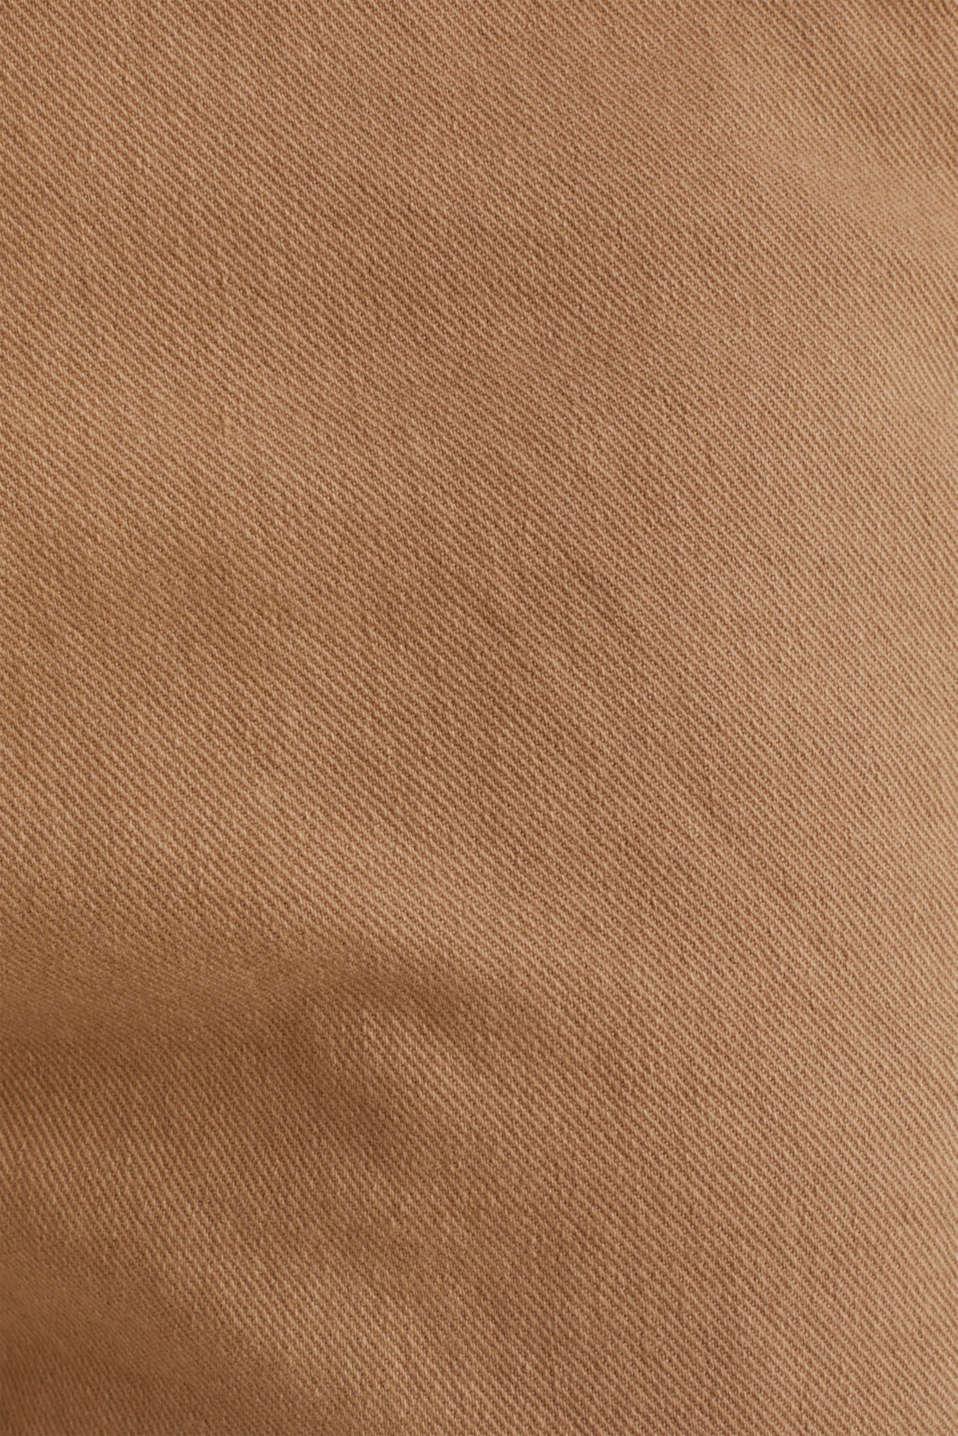 Stretch cargo shorts, CAMEL, detail image number 4